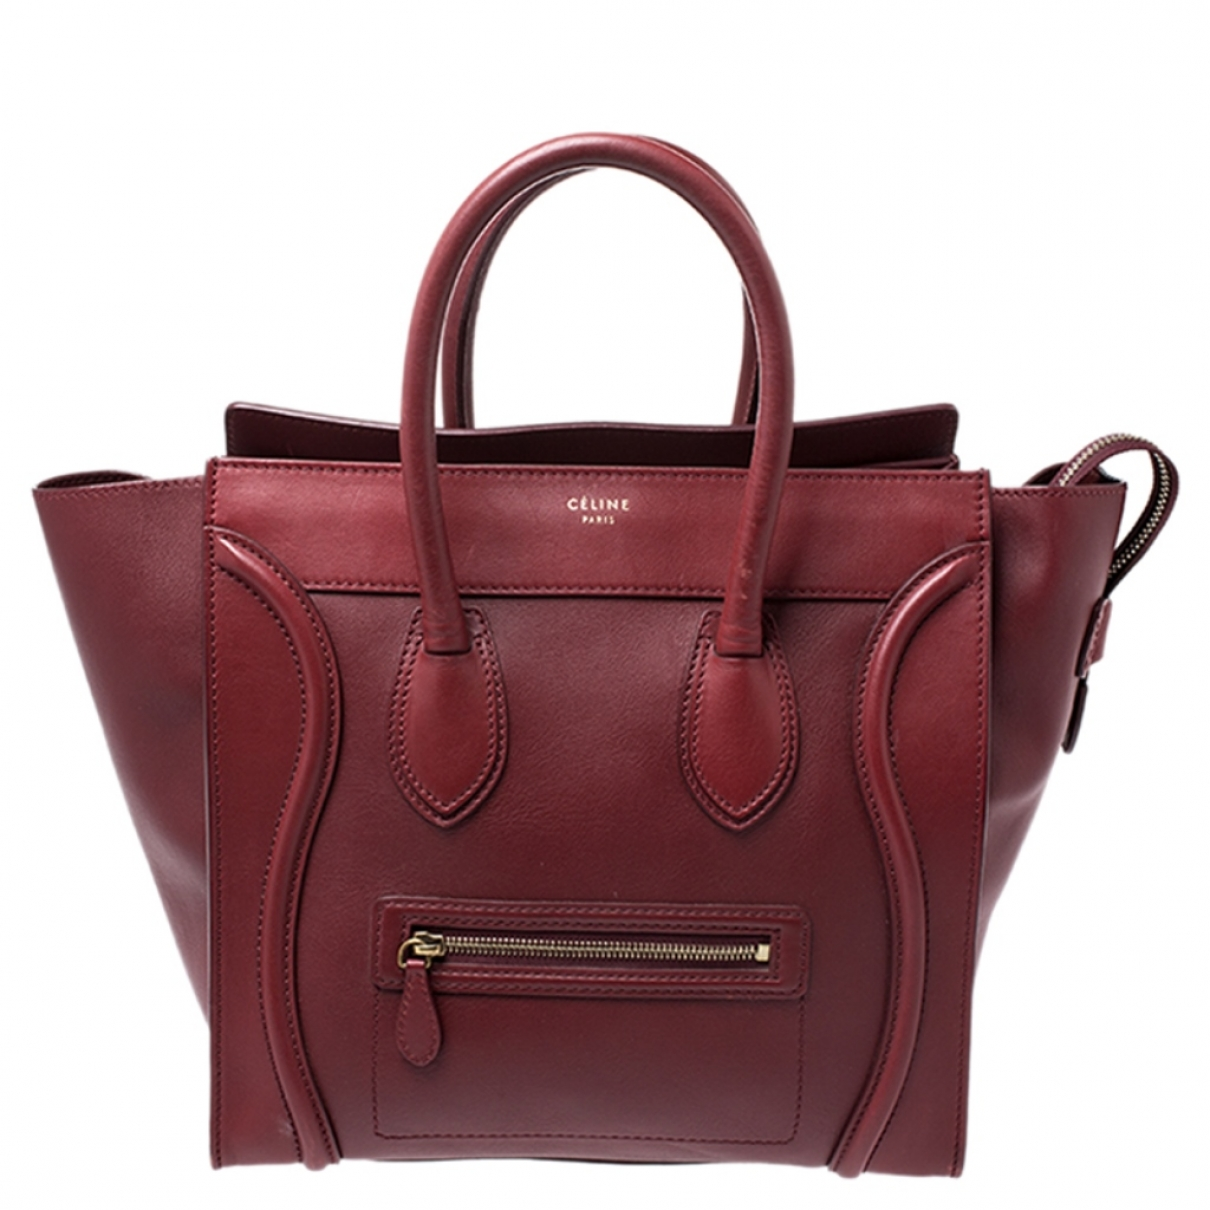 Celine Luggage Red Leather handbag for Women \N